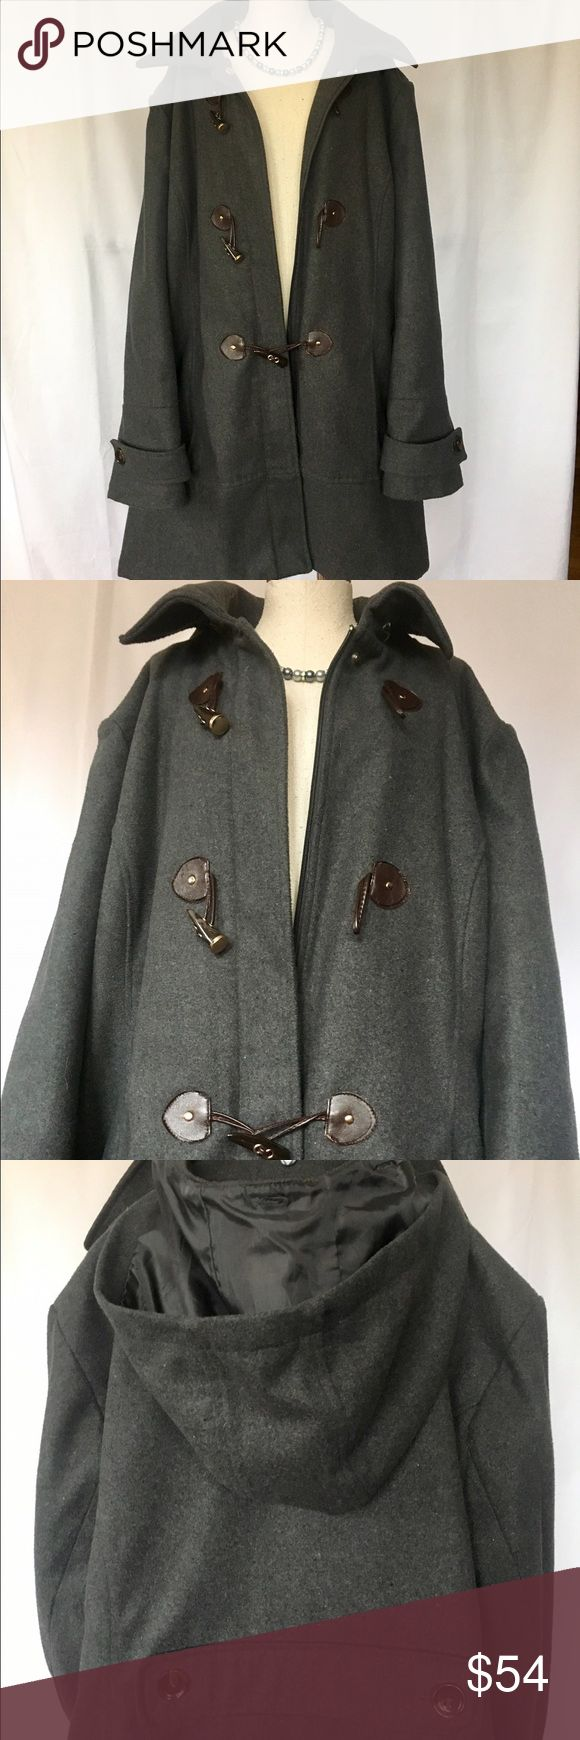 Grey Pea- Coat Great Grey Color, Hidden Zipper in Front with 3 Faux Tusk & Bands (Really Latch :).   Has Detachable Hood, Super Cozy- Jackets & Coats Pea Coats